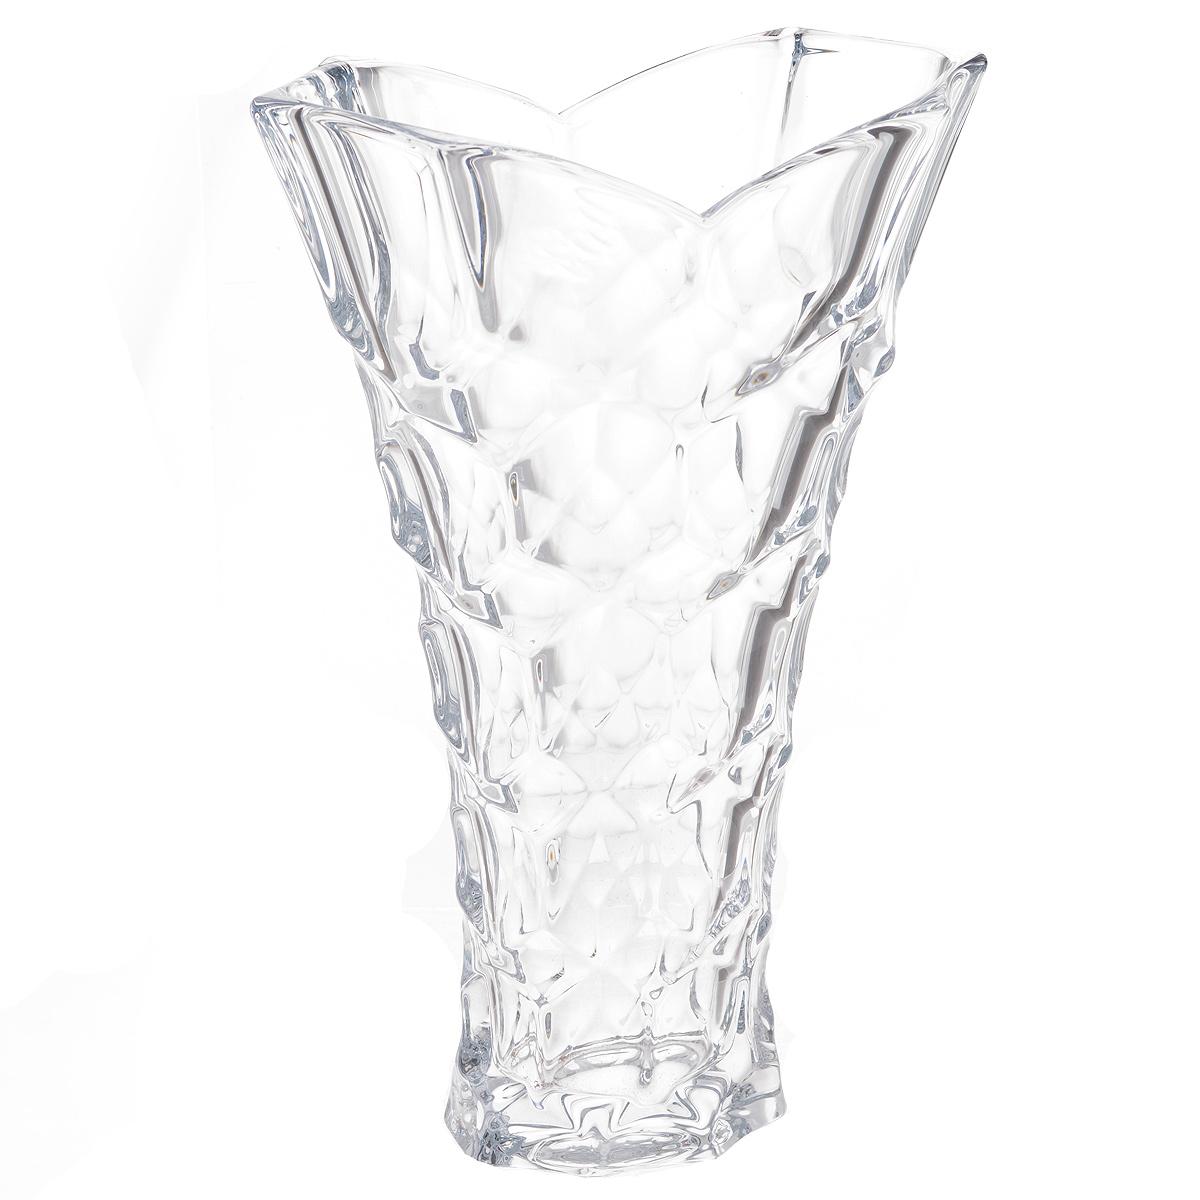 Ваза Crystalite Bohemia Медовые соты, высота 35,5 см ваза 33 см quadro crystalite bohemia 8 марта женщинам